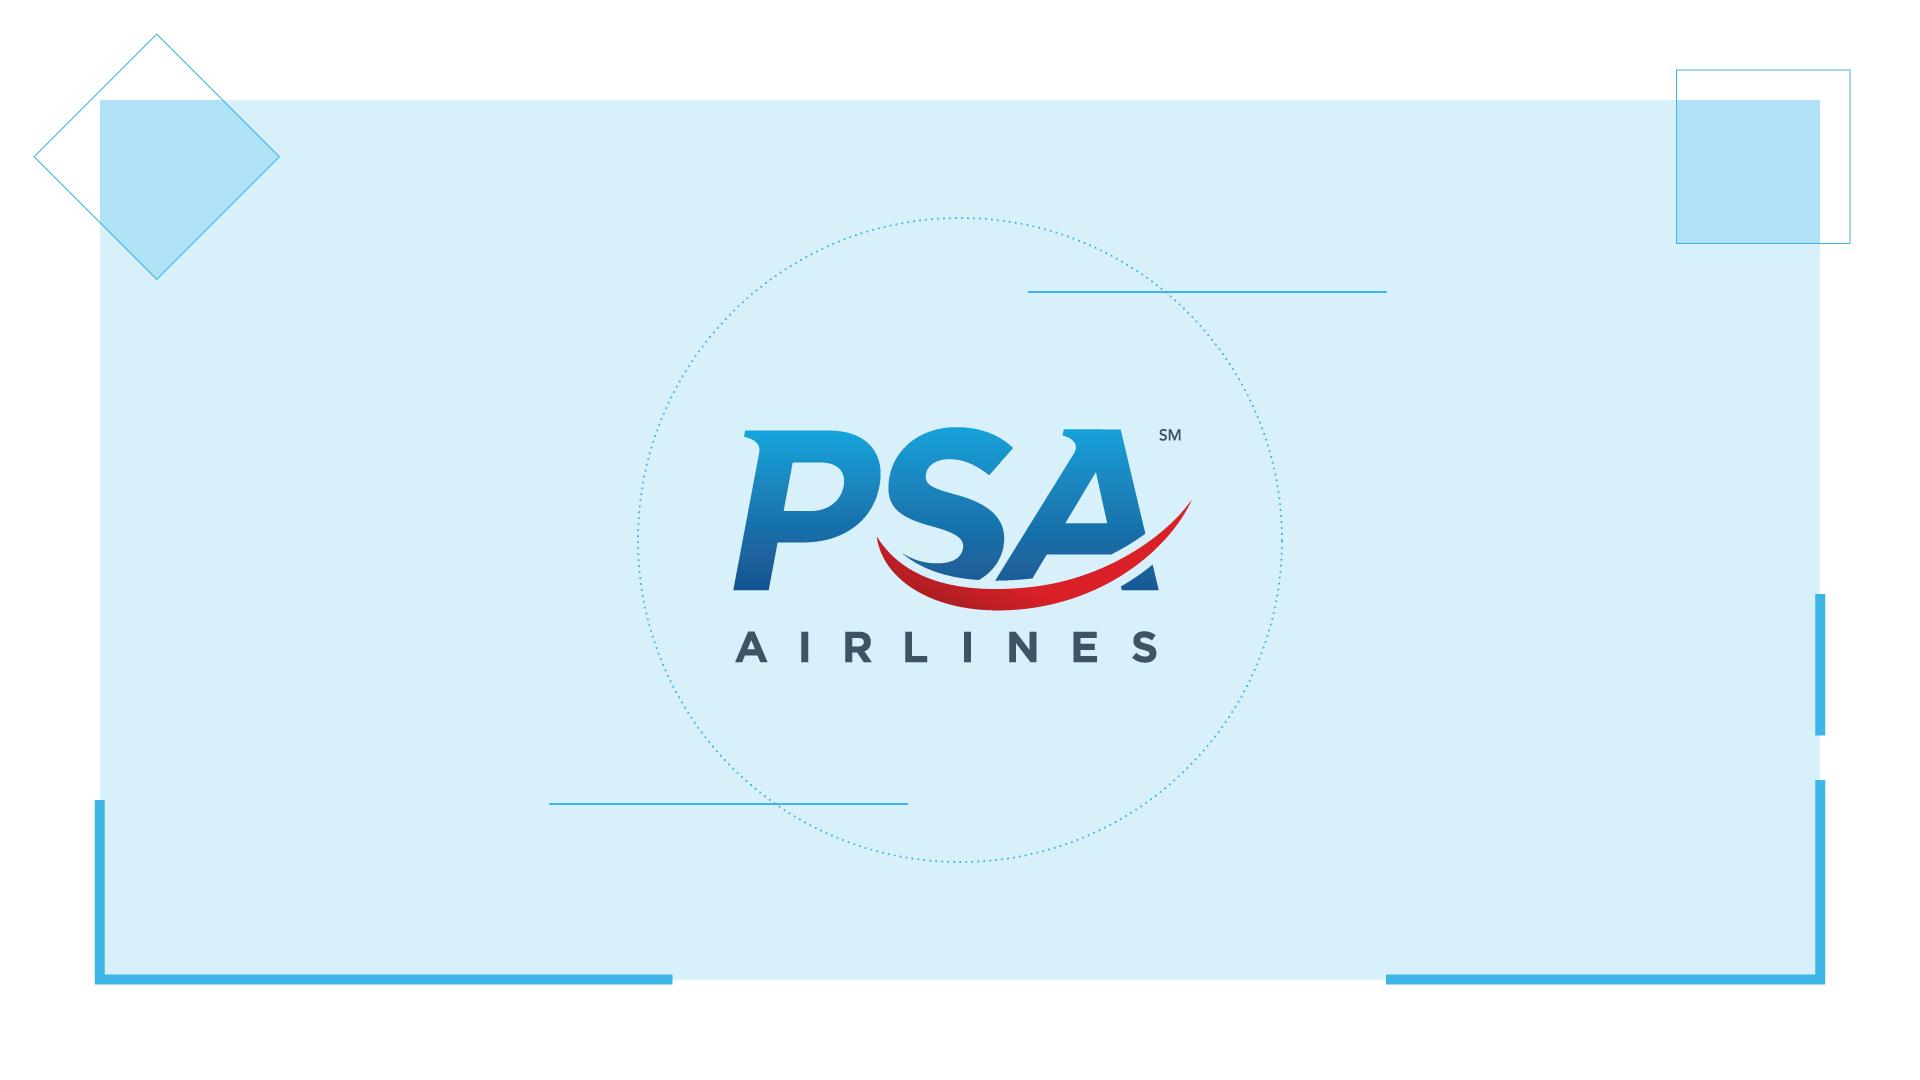 PSA Way Promotional Image